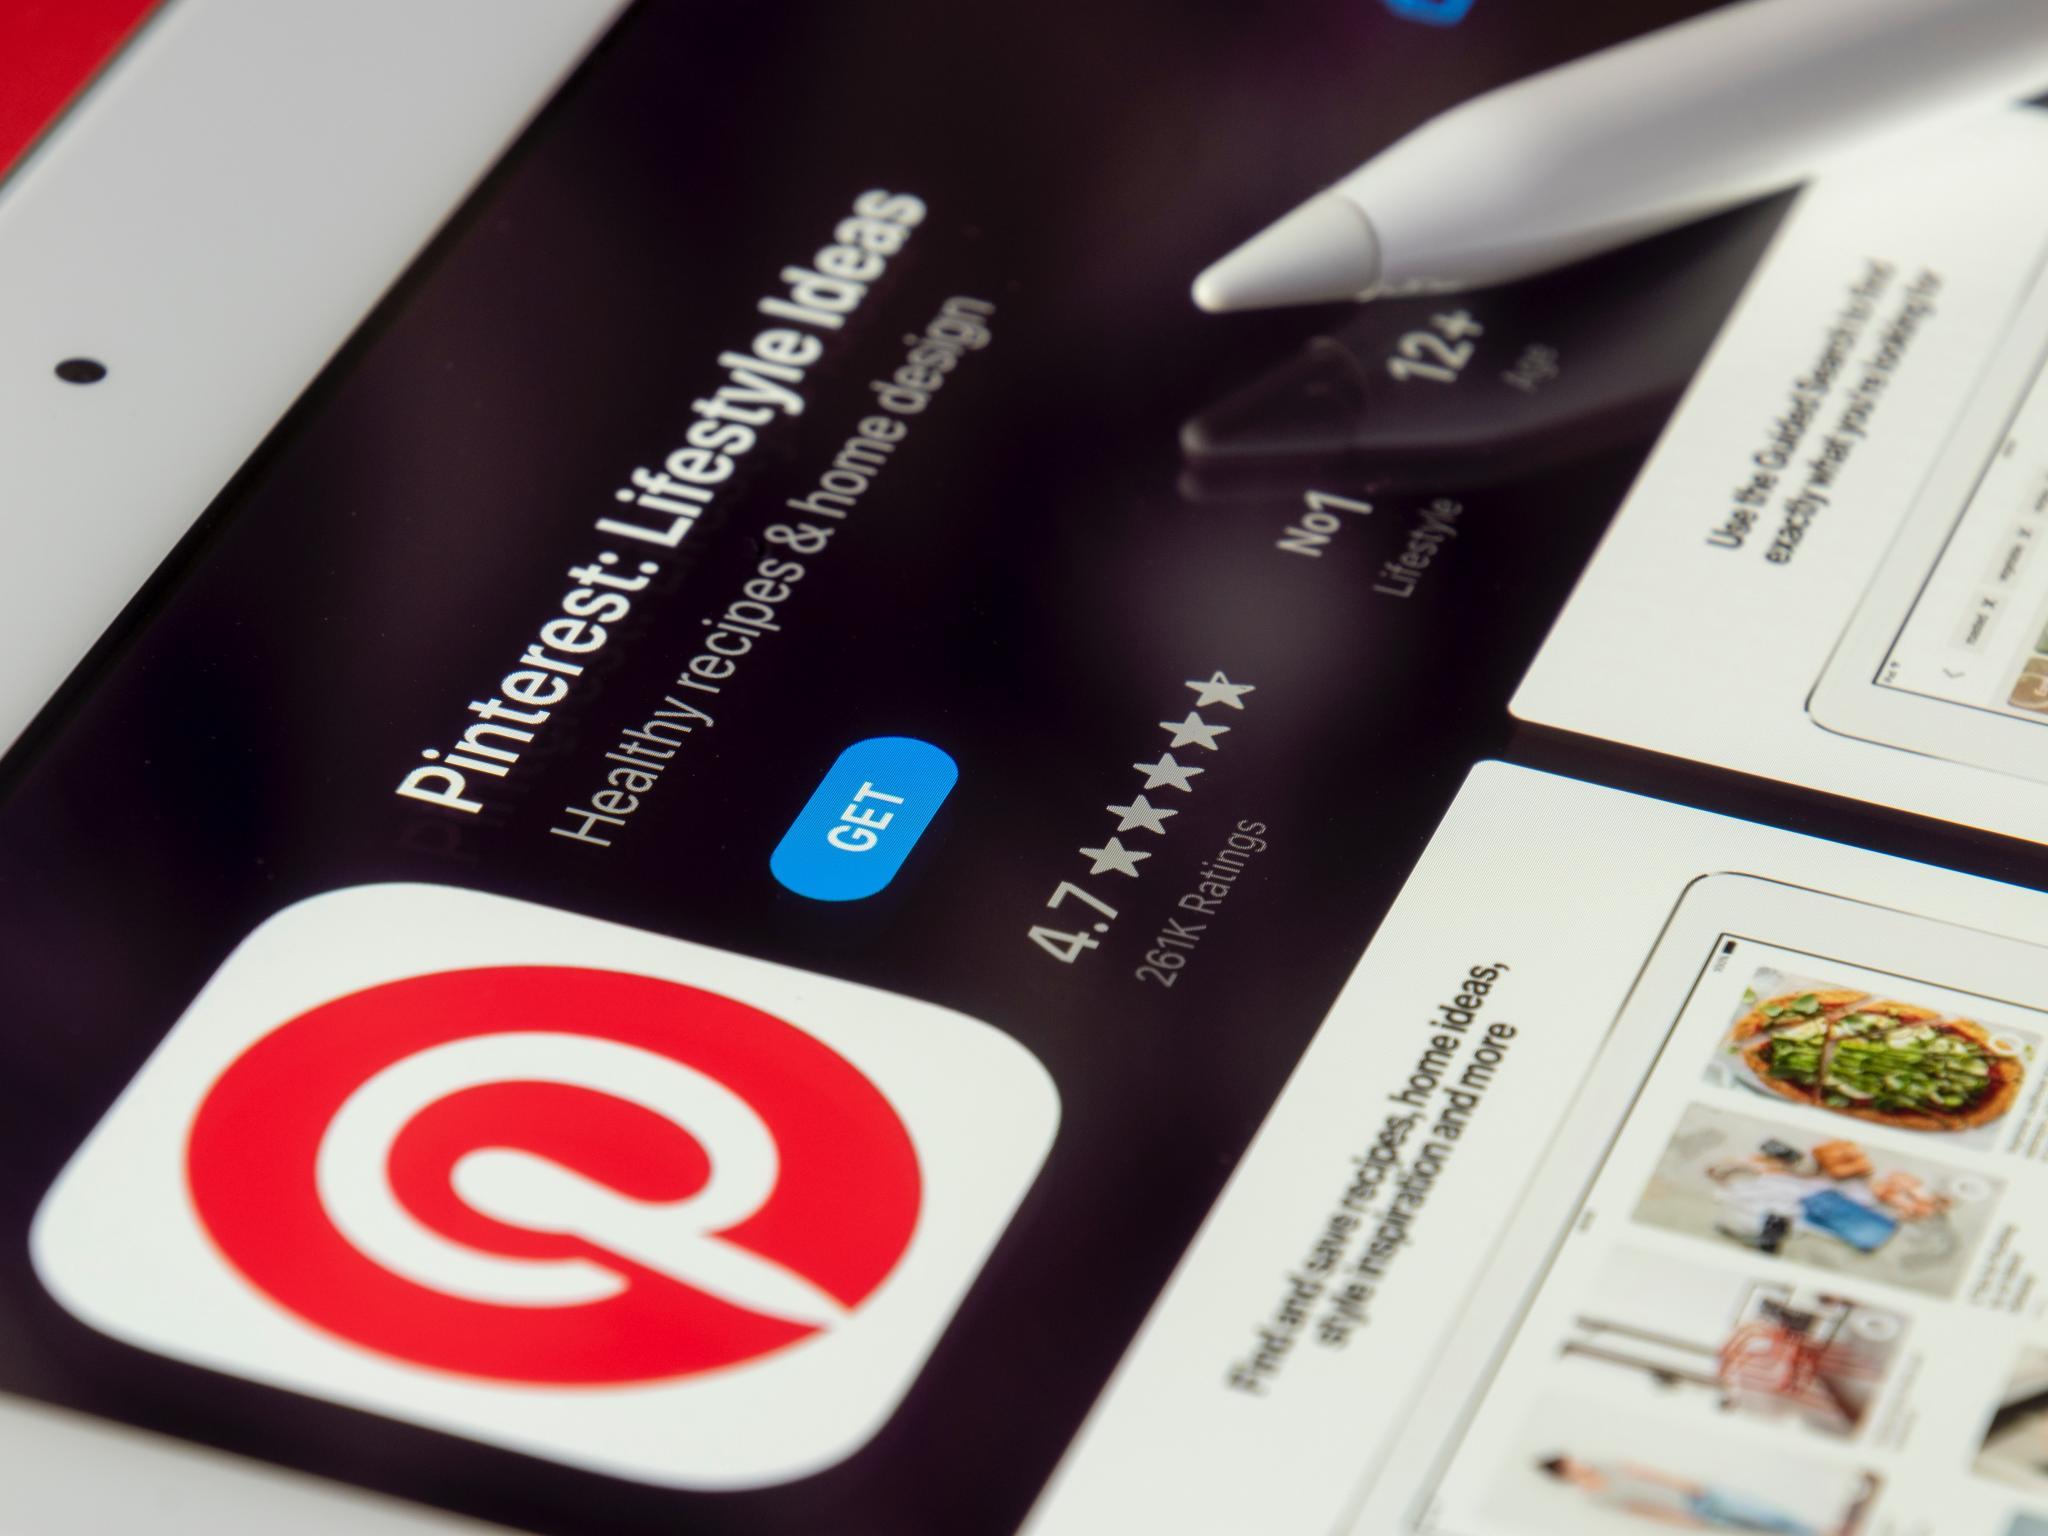 Pinterest NYSEPINS Stock Price, News, Charts   Benzinga